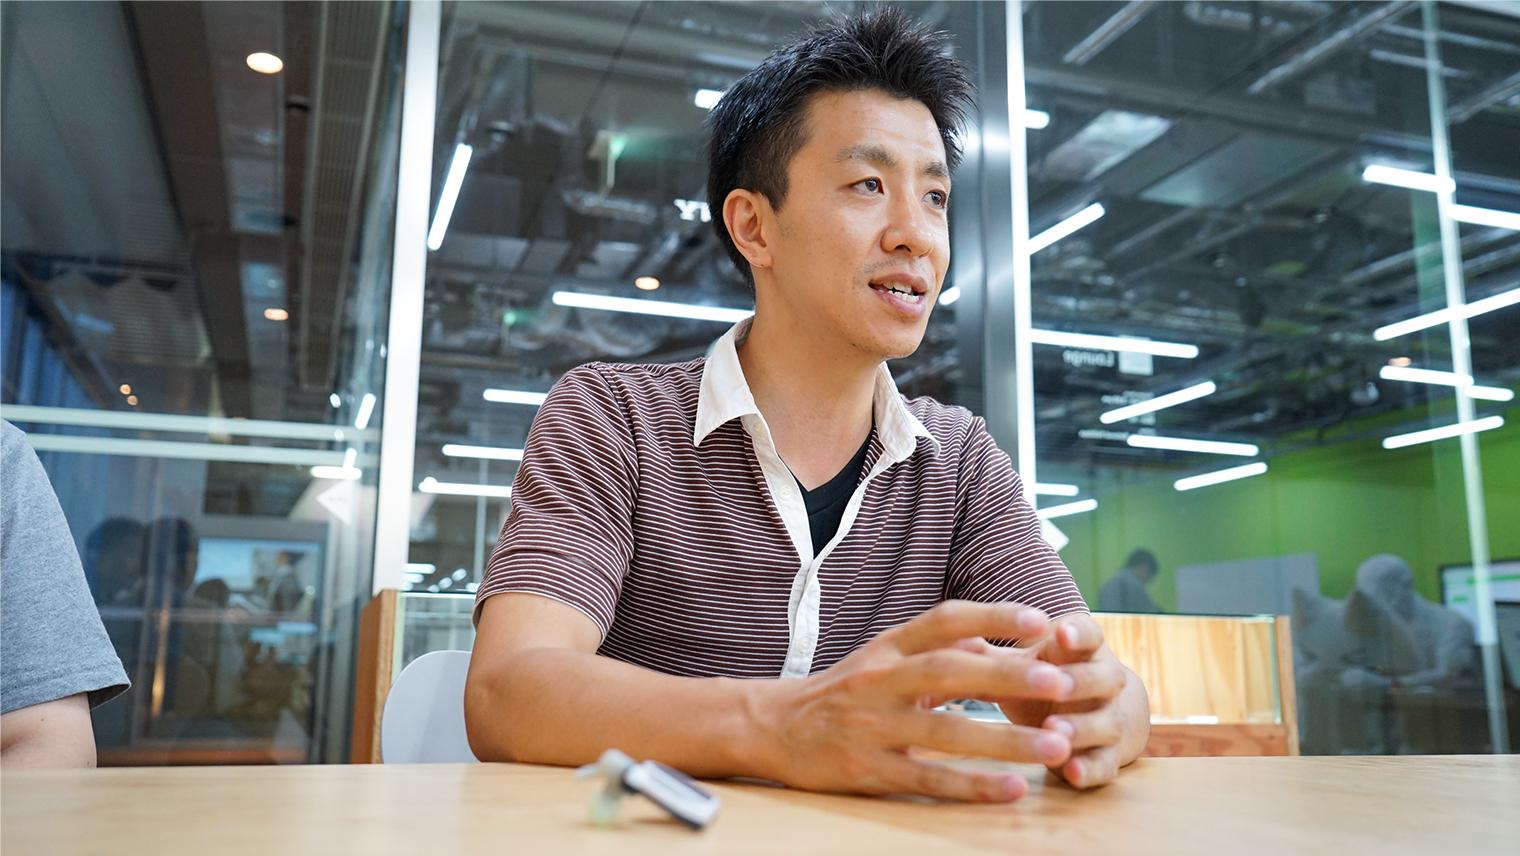 佐々木啓太 ソニー株式会社 Startup Acceleration部 NYSNO Project電気担当